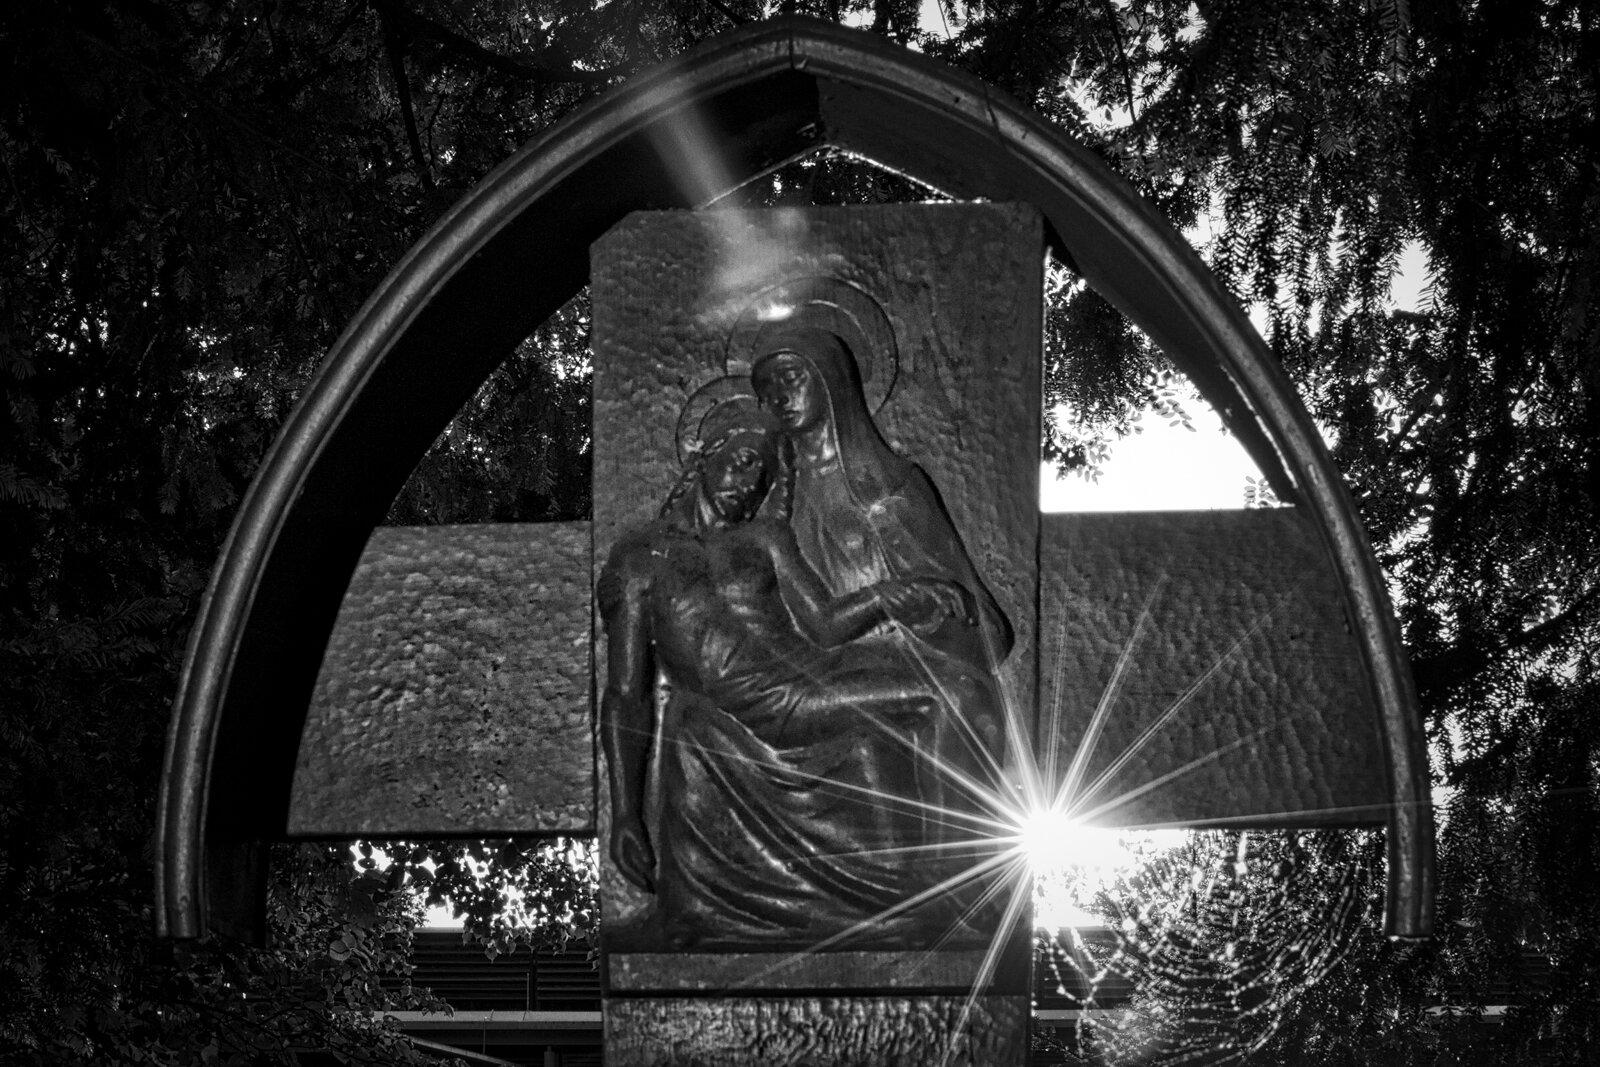 02__D7C0470_2014_06Fridehof-Edit-2____Friedhof-KA.jpg